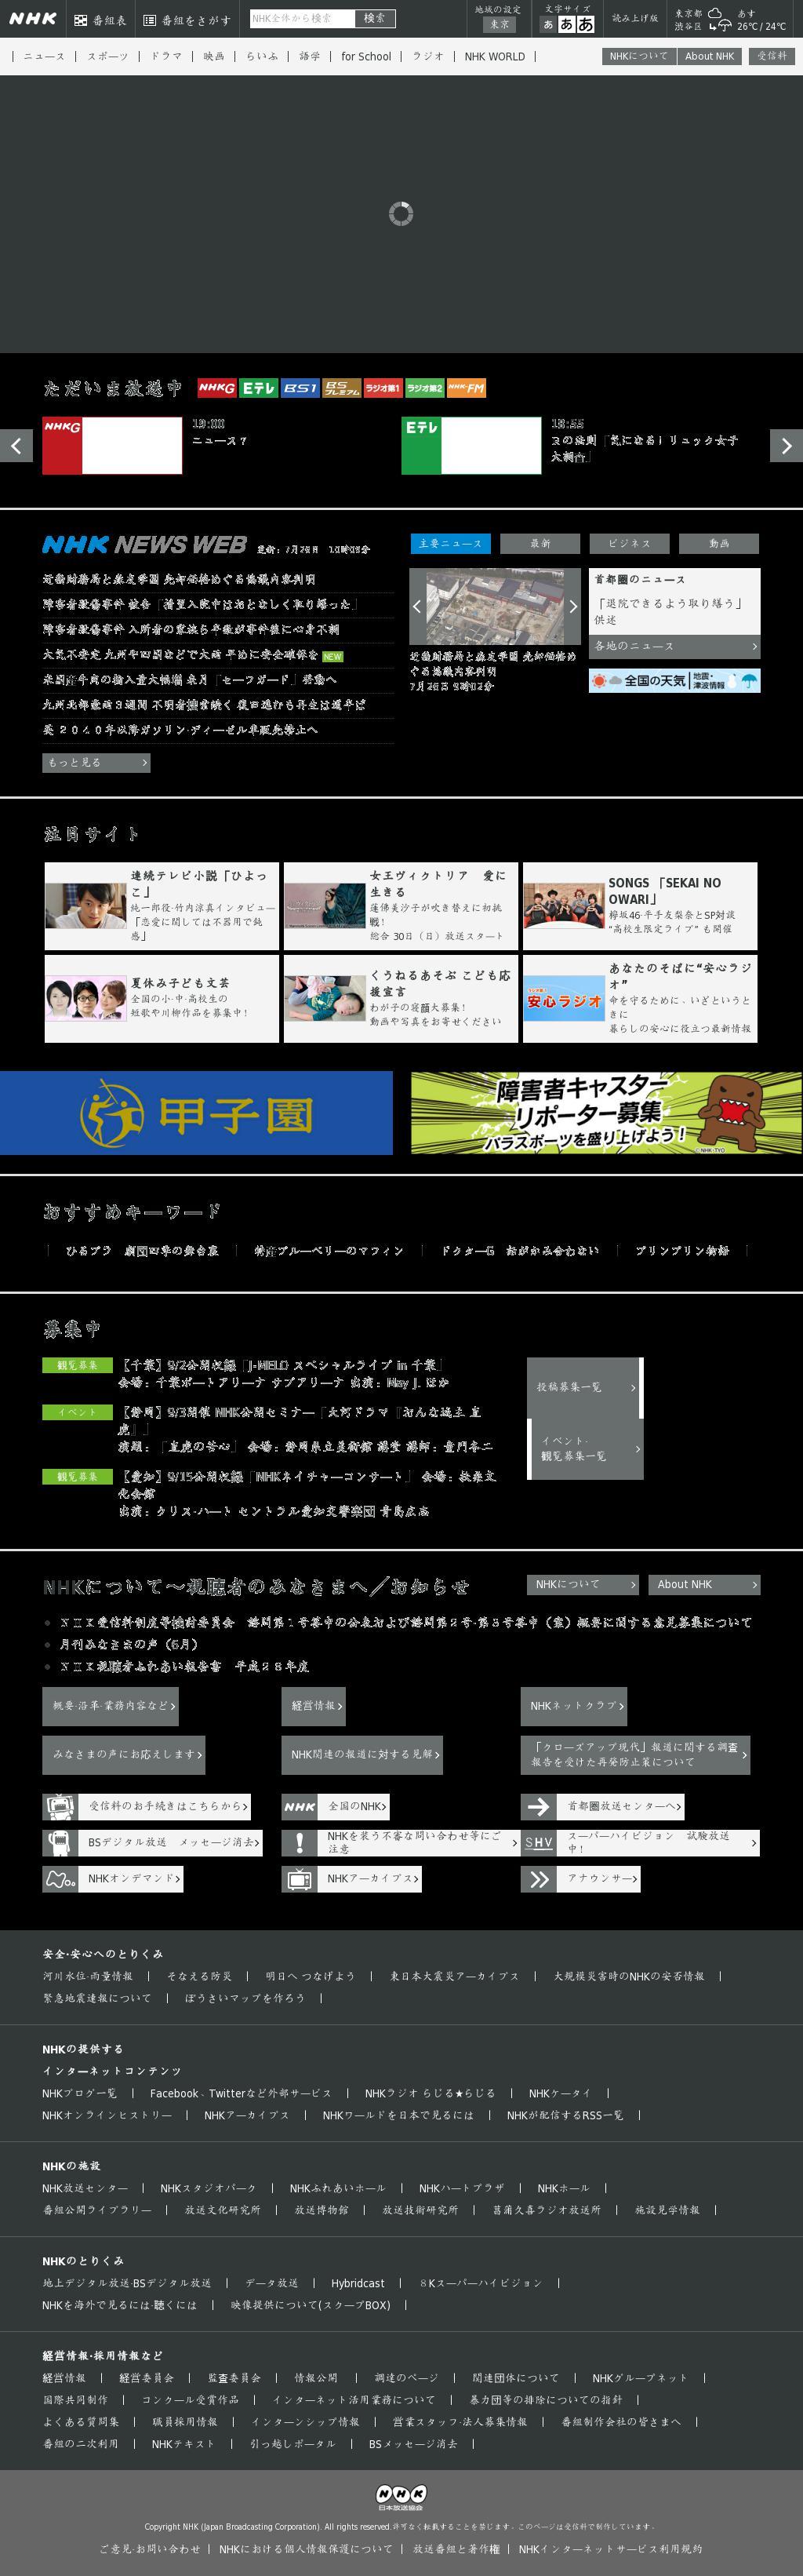 NHK Online at Wednesday July 26, 2017, 10:13 a.m. UTC